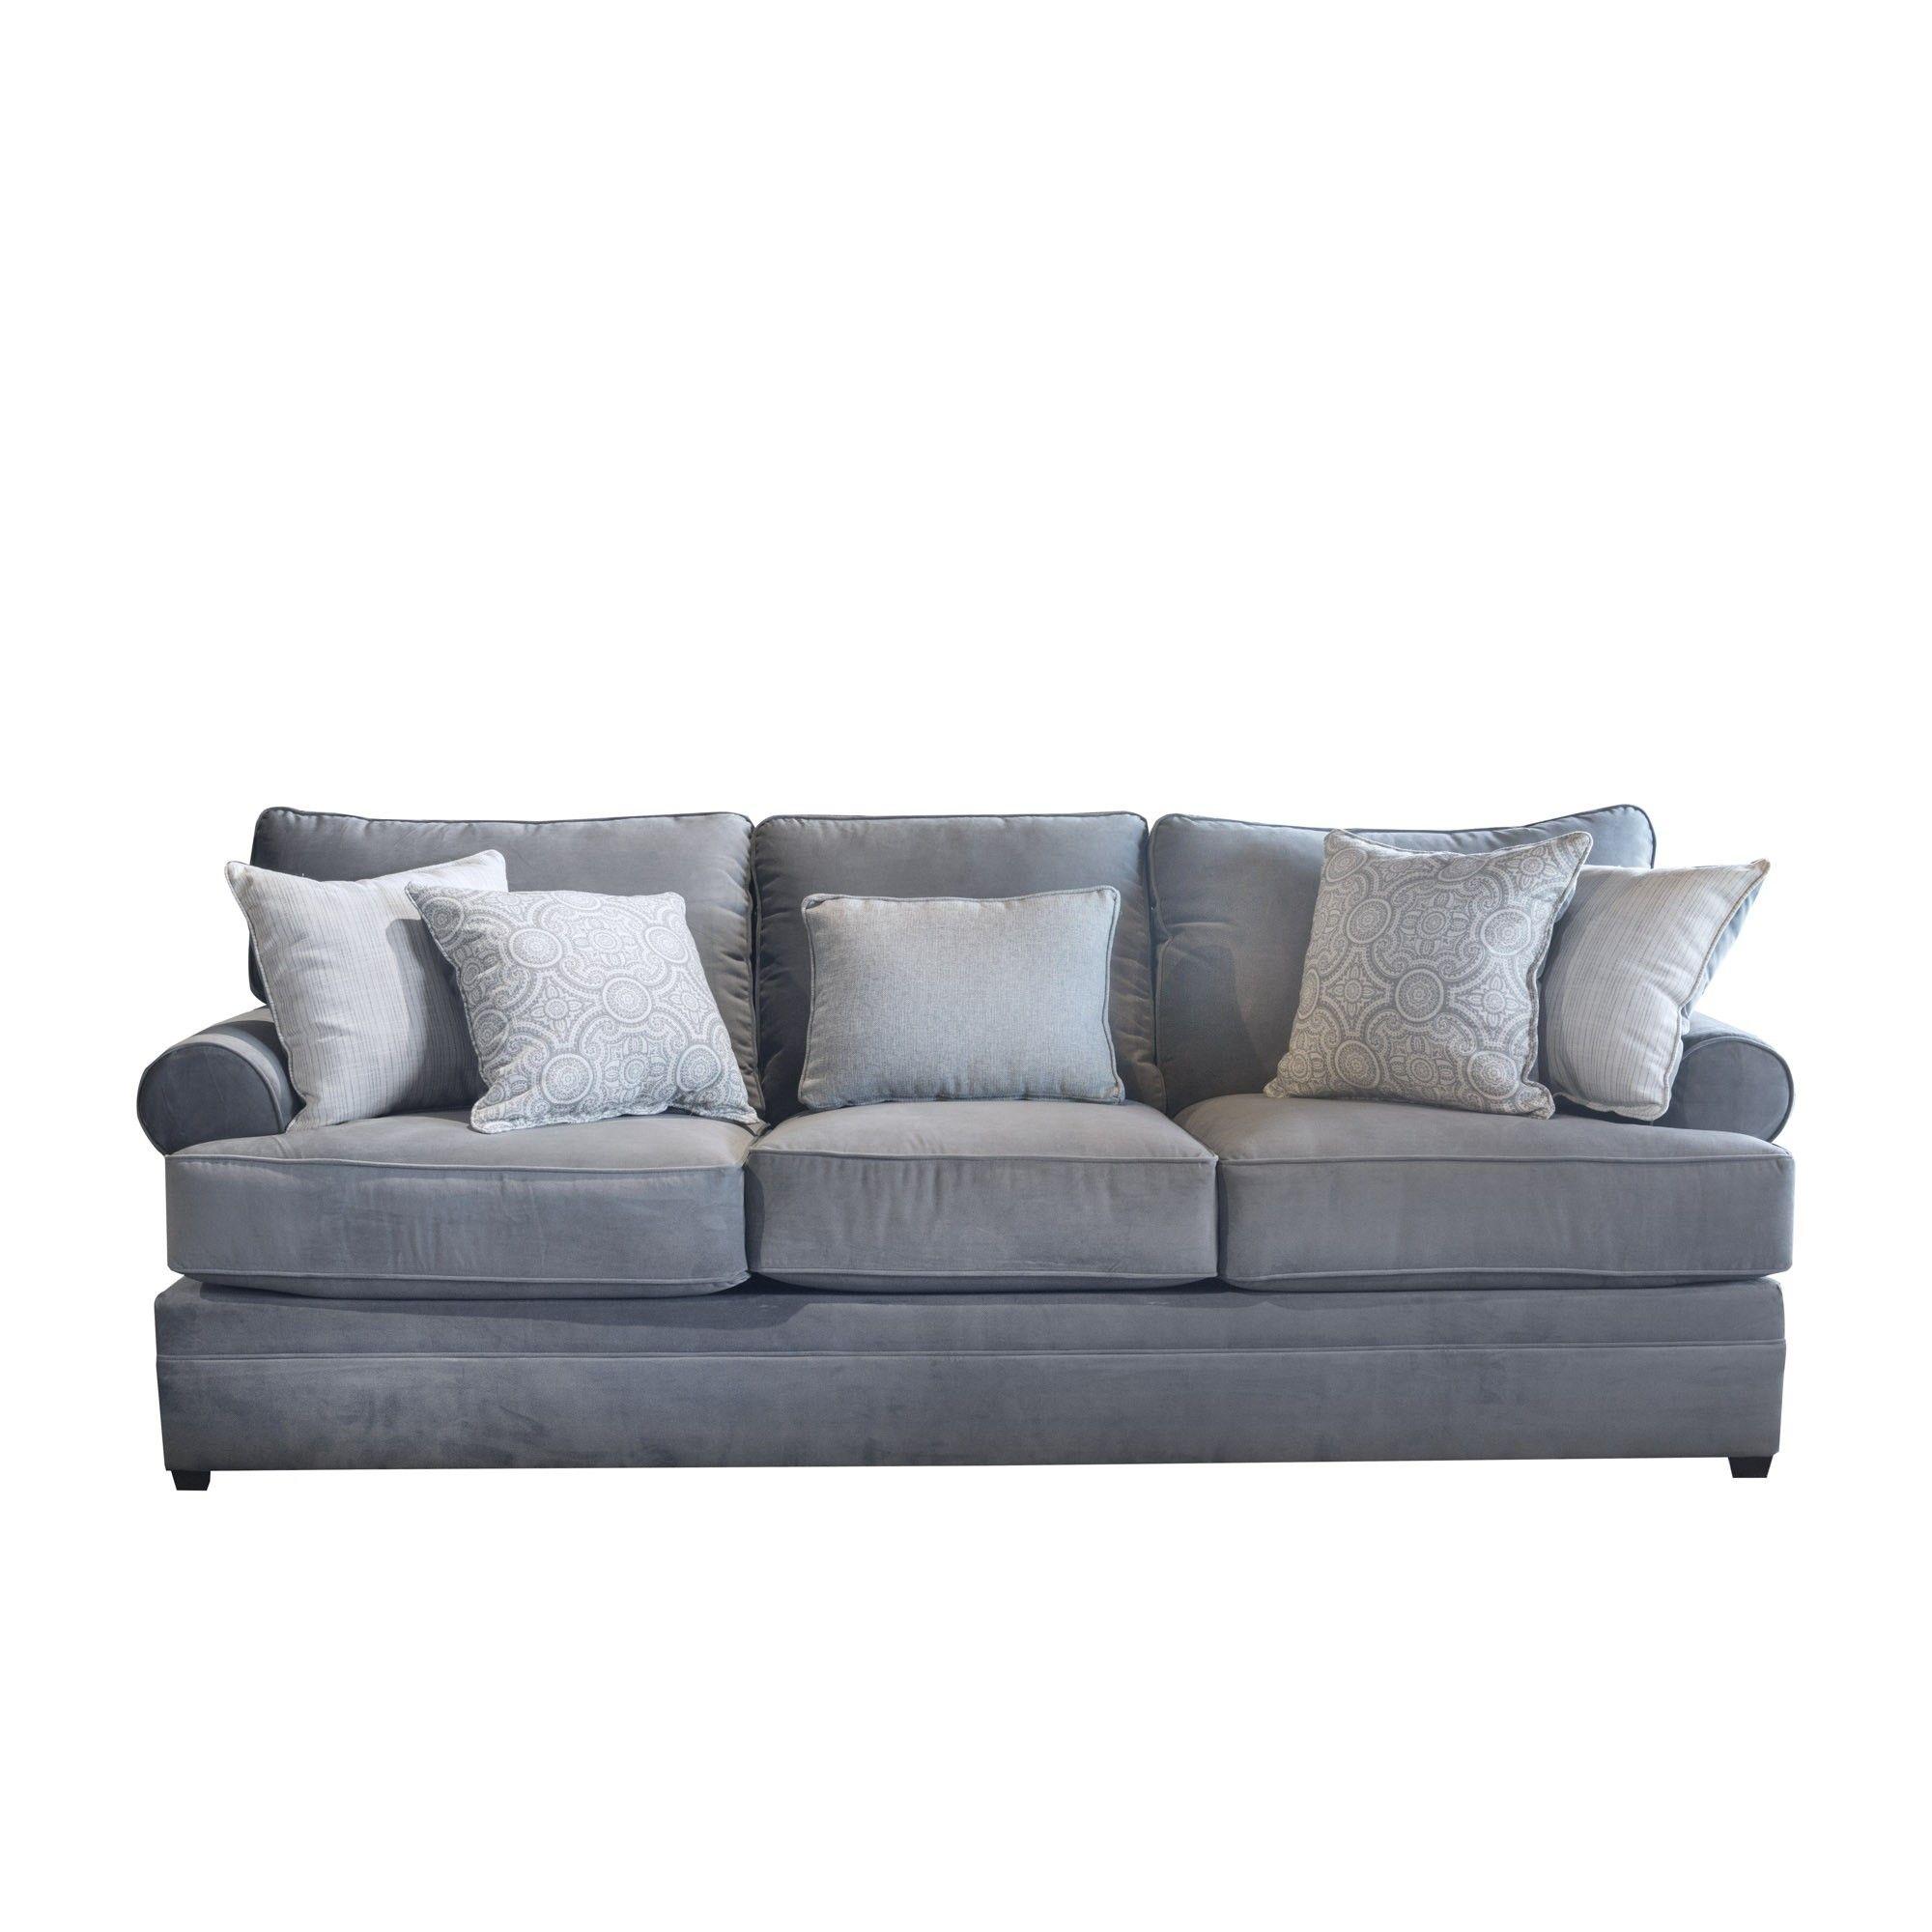 Abington Sofa | Design | Pinterest | Simmons Beautyrest, Seat